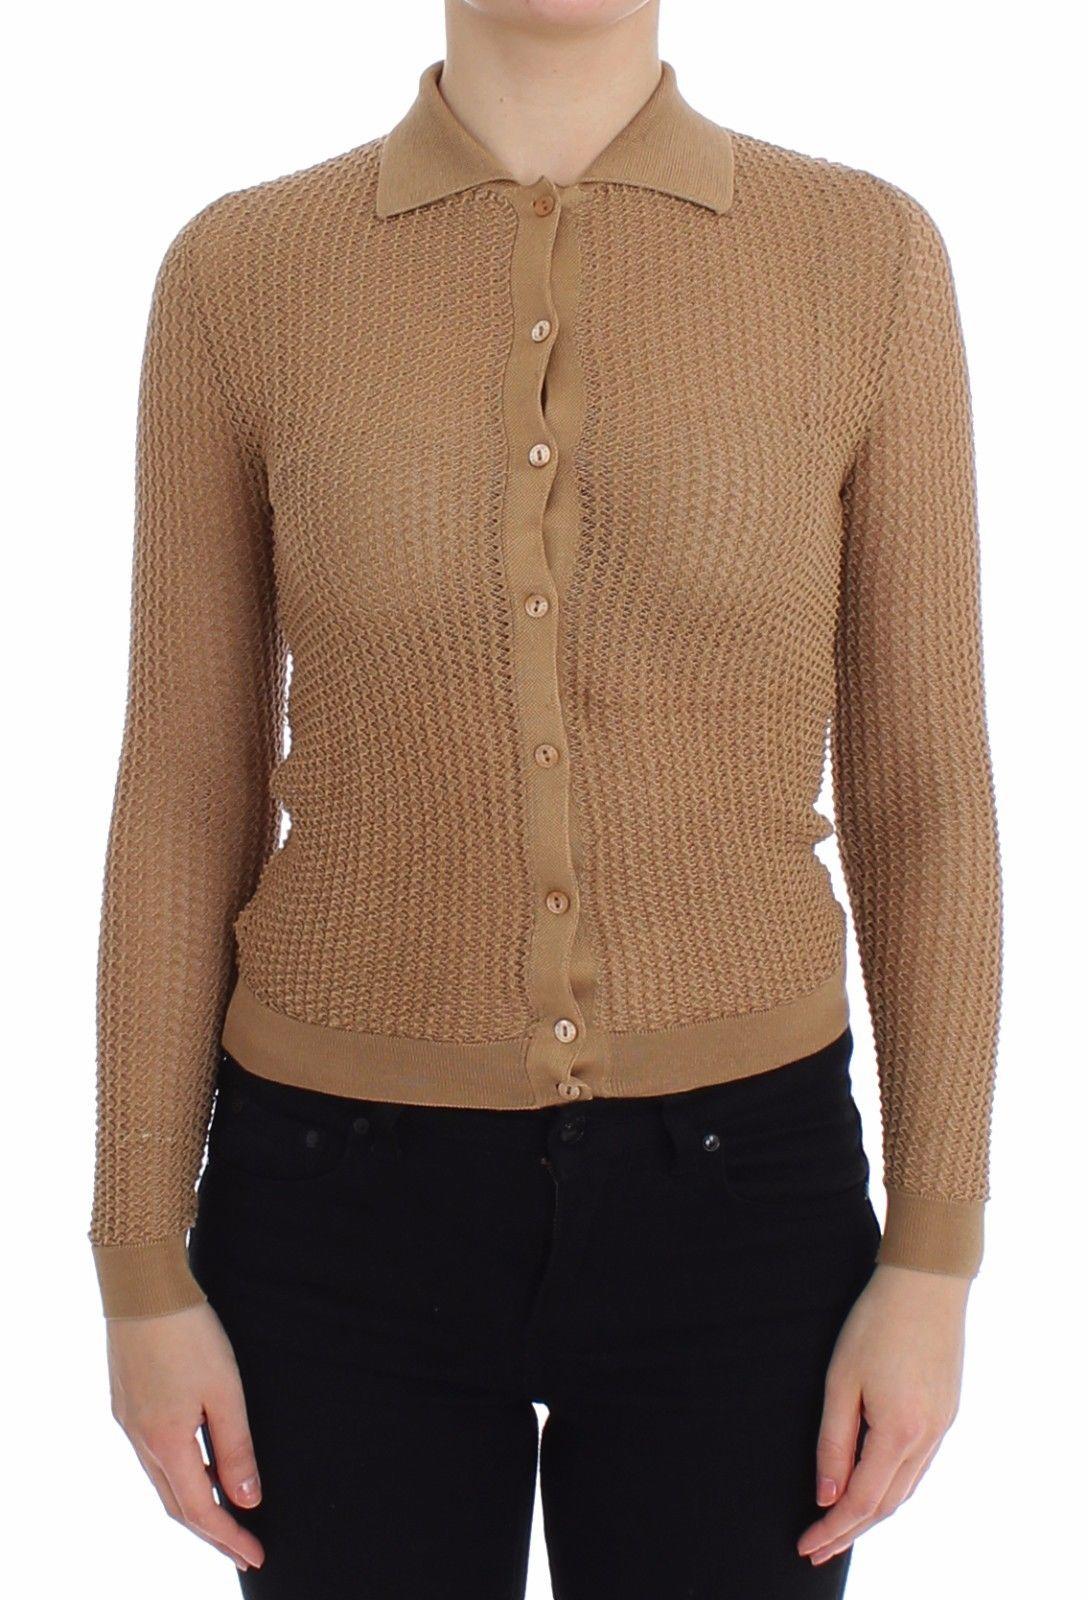 Dolce & Gabbana Women's Knitted Cotton Cardigan Beige SIG13249 - IT36   XS